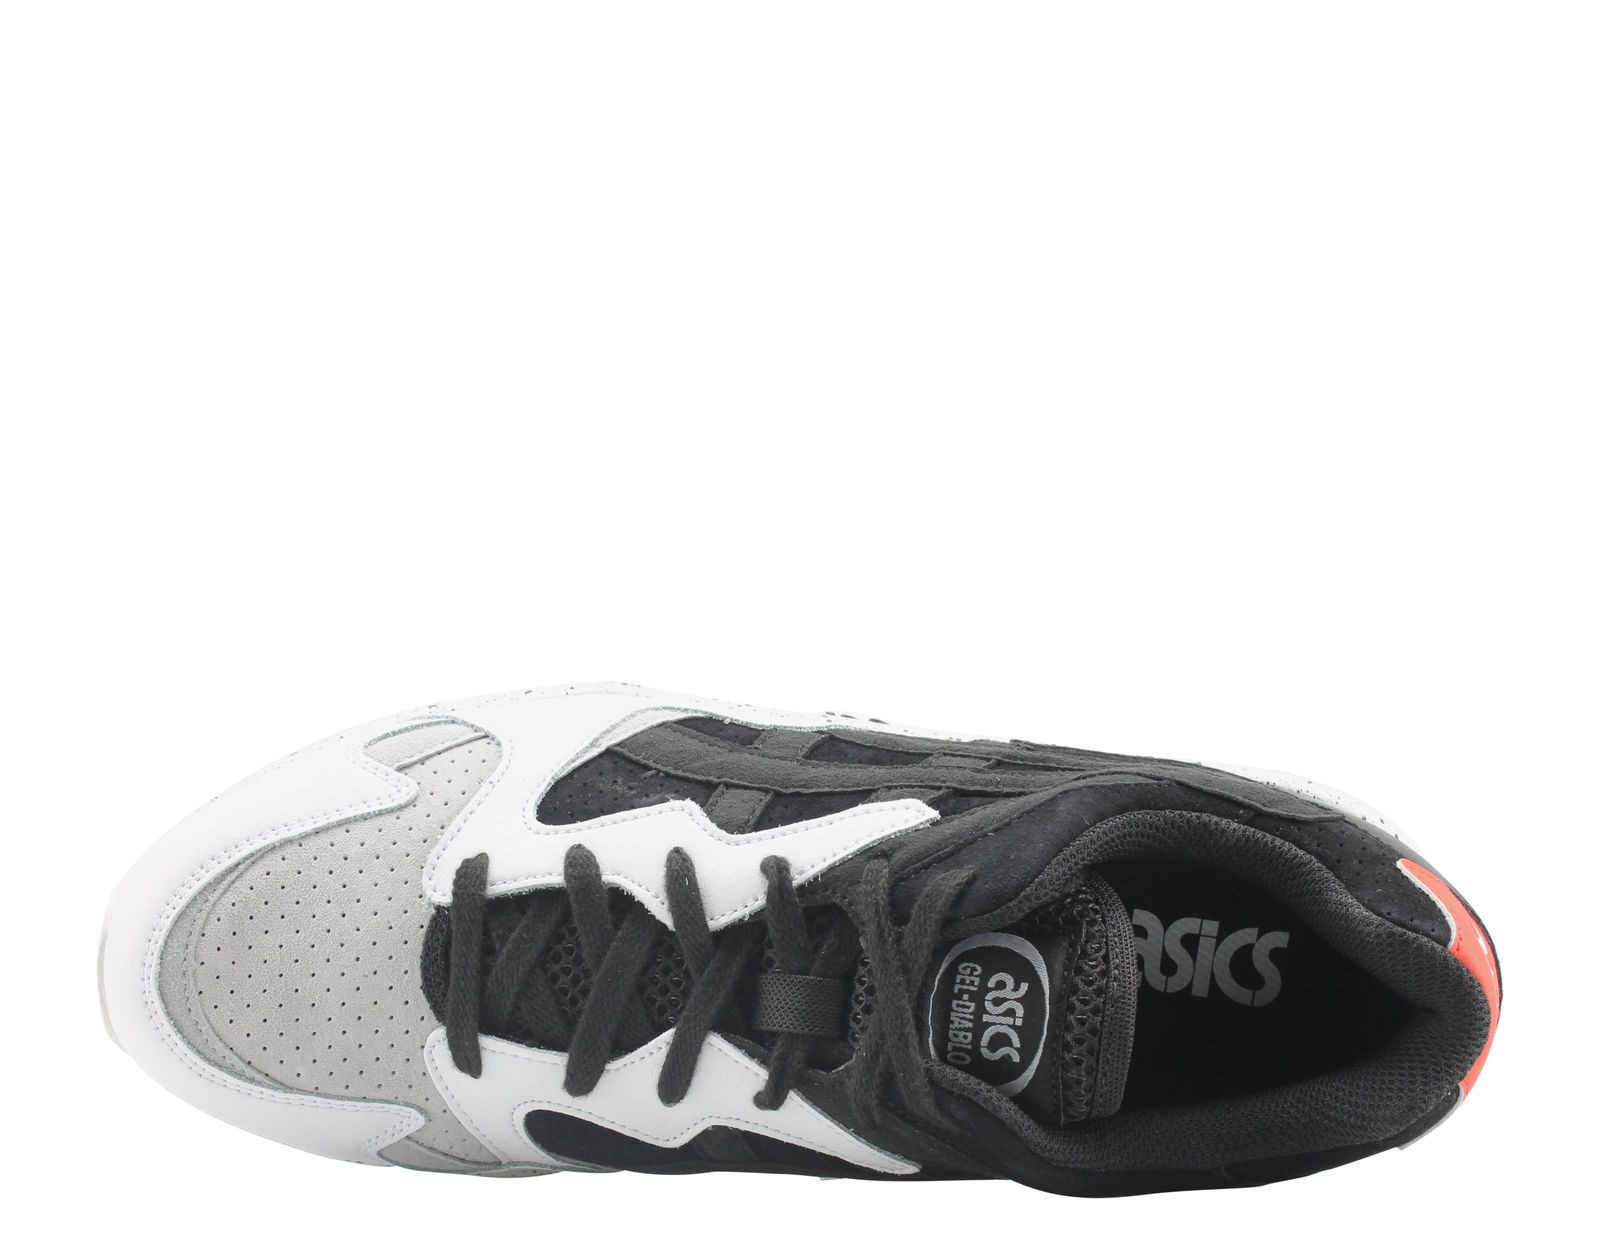 9090 Men's Casual Asics Gel Shoes Hl7y3 Ebay Diablo Black XqwZq5xA